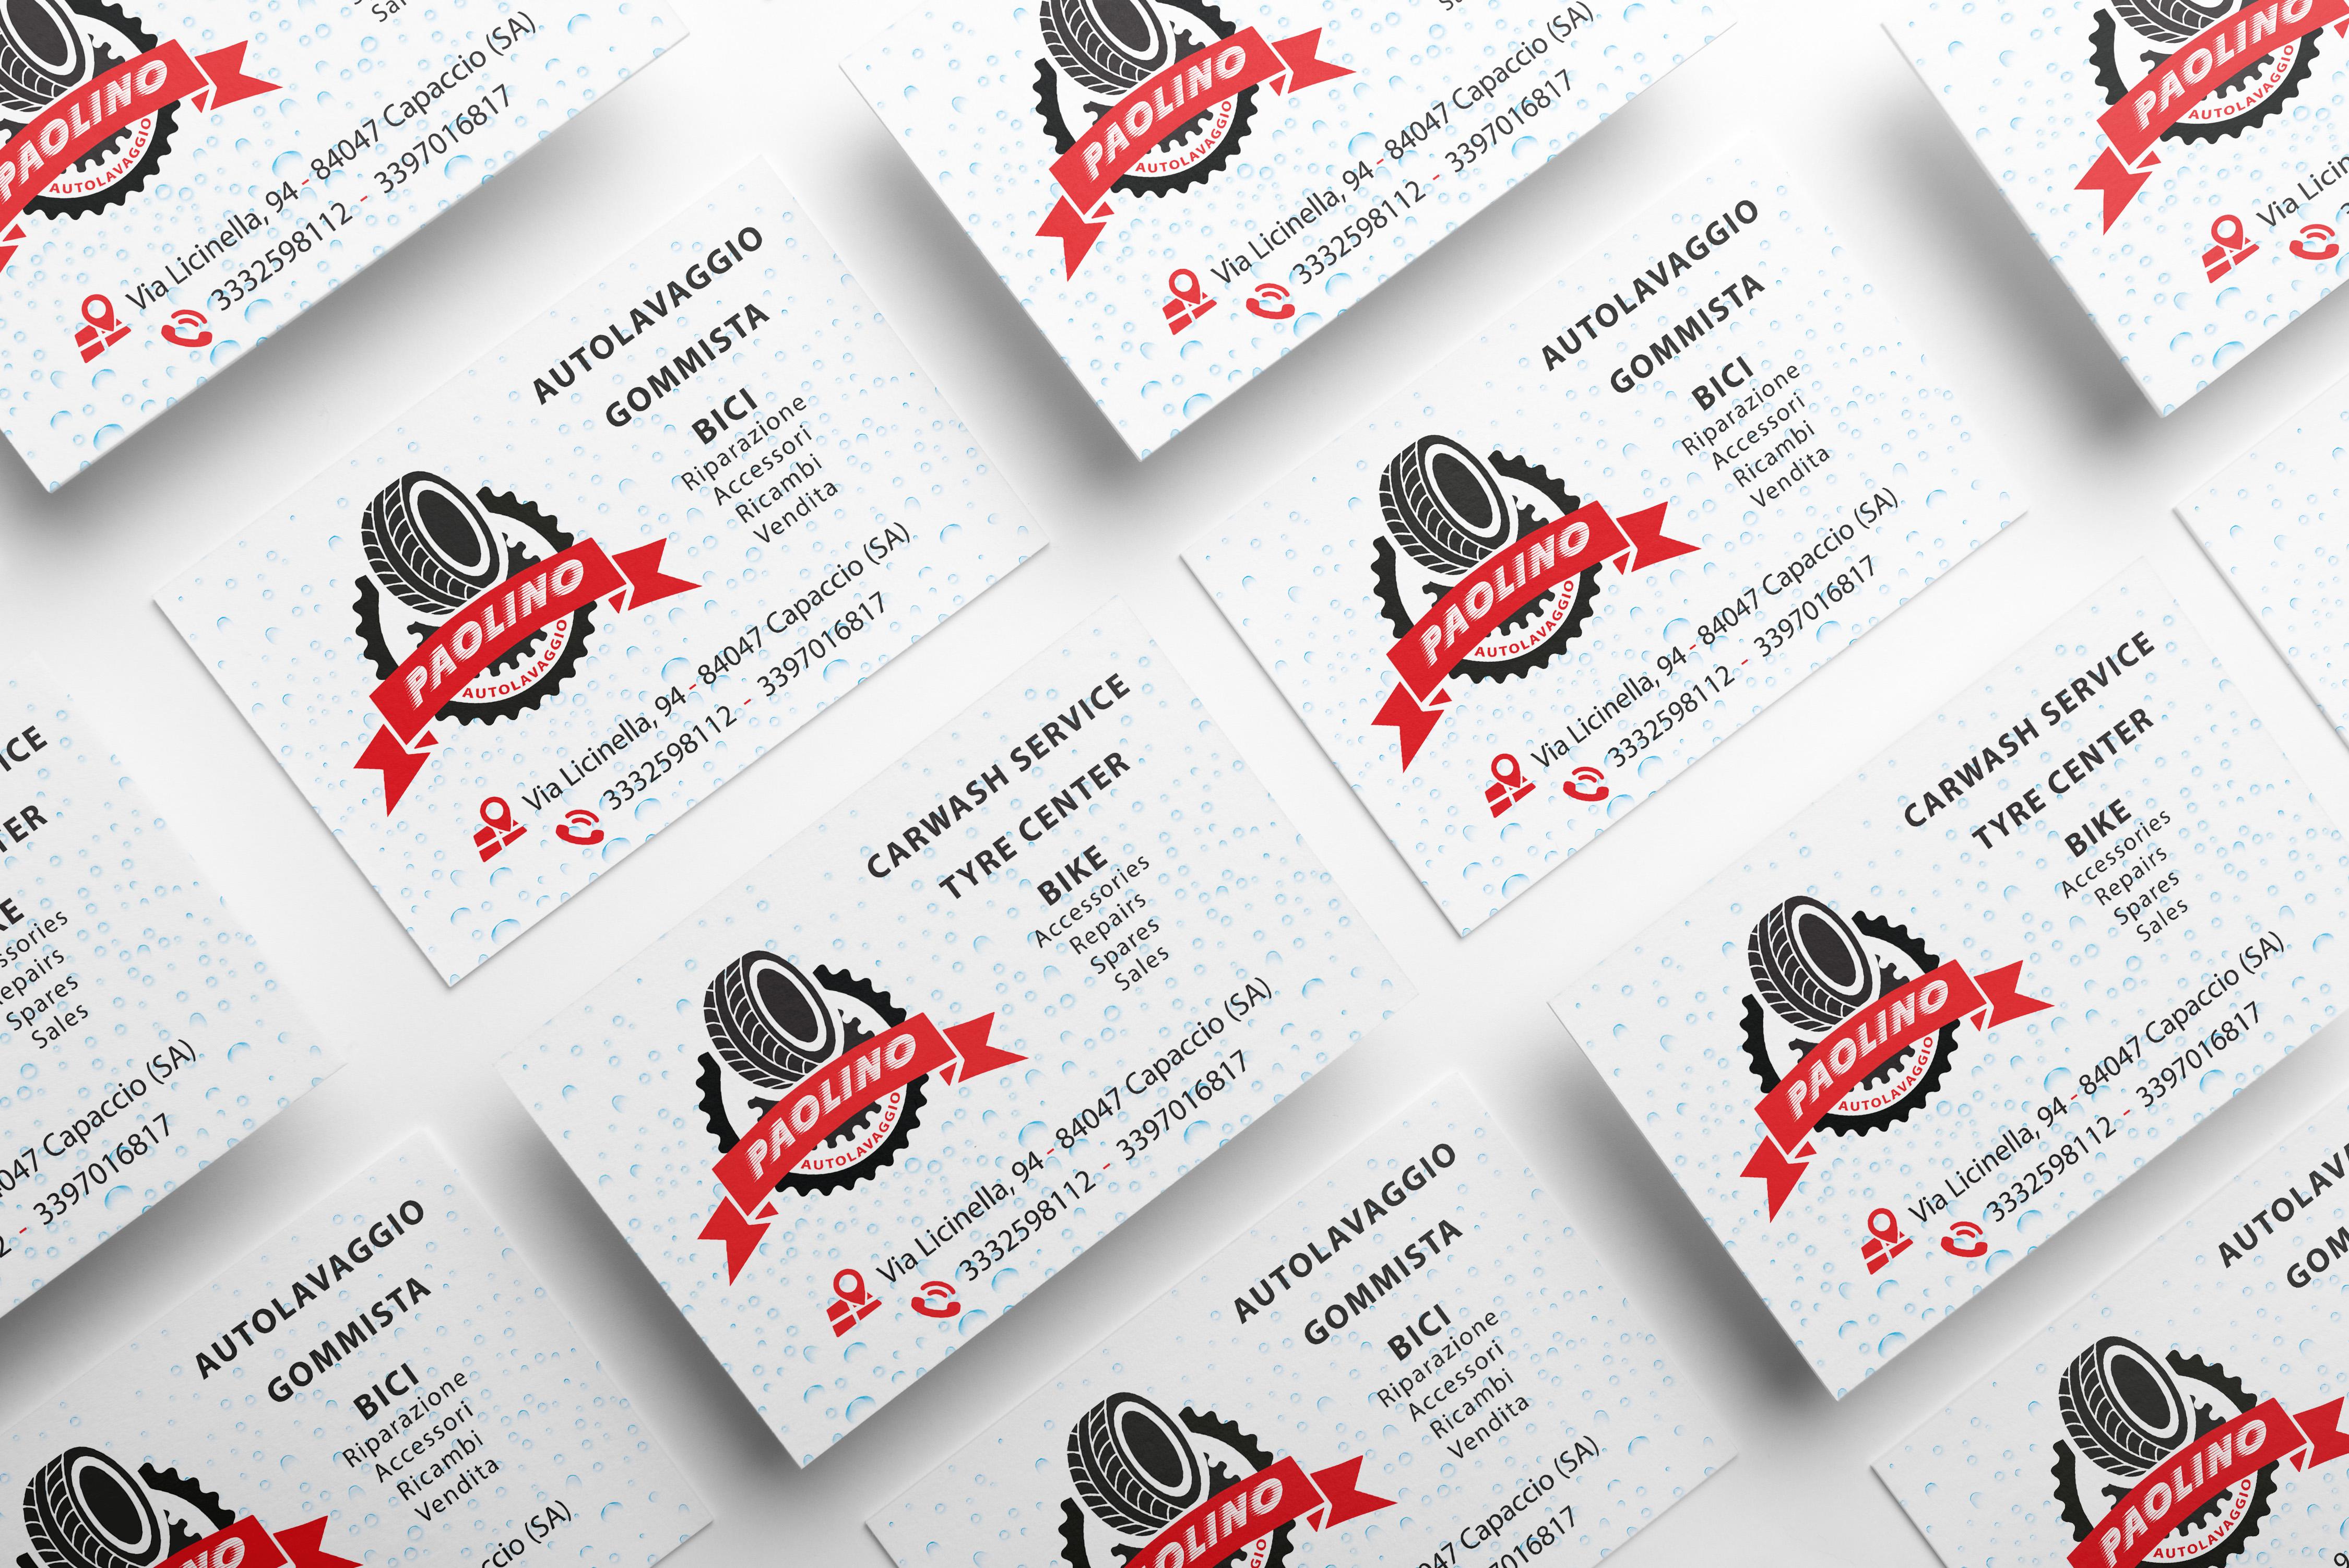 Bilingual business card